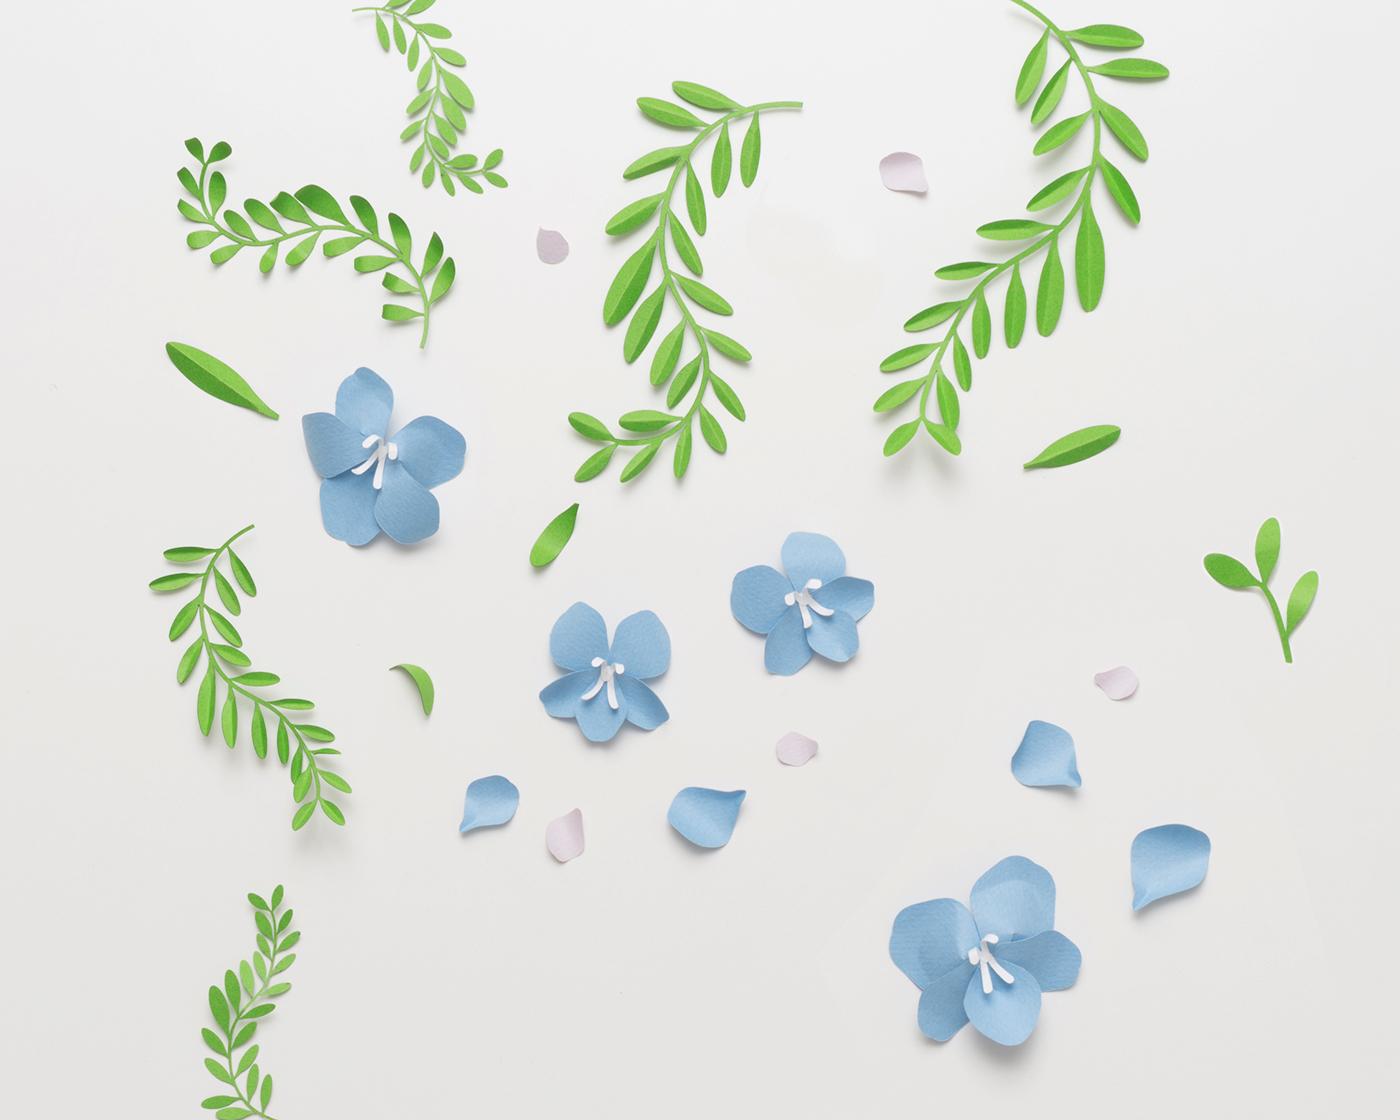 paper ILLUSTRATION  flower craft paper craft poster graphic design